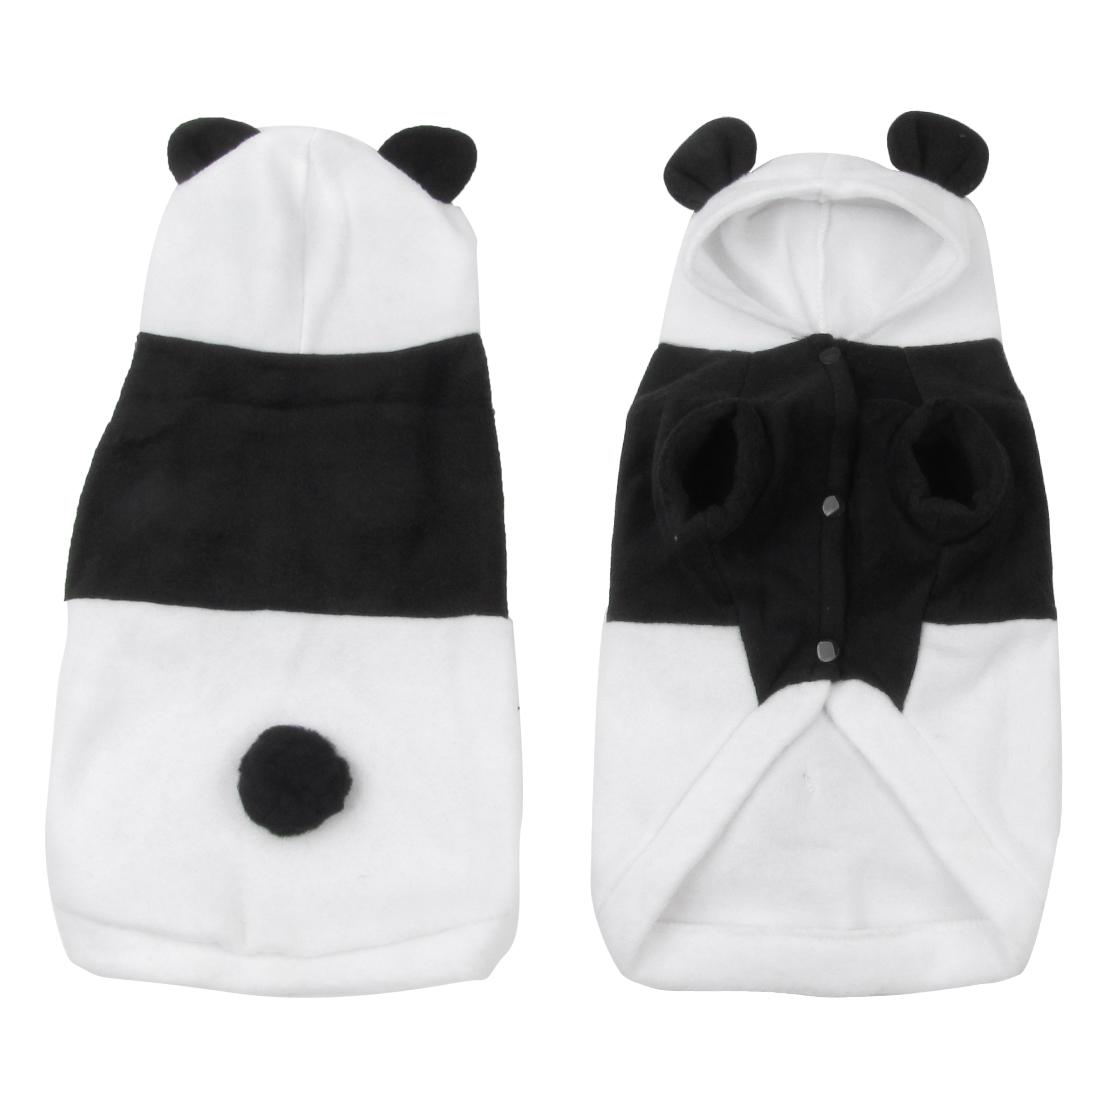 Black White Hoodie Panda Shpaed Pet Dog Puppy Outerwear Jacket Coat Size XL